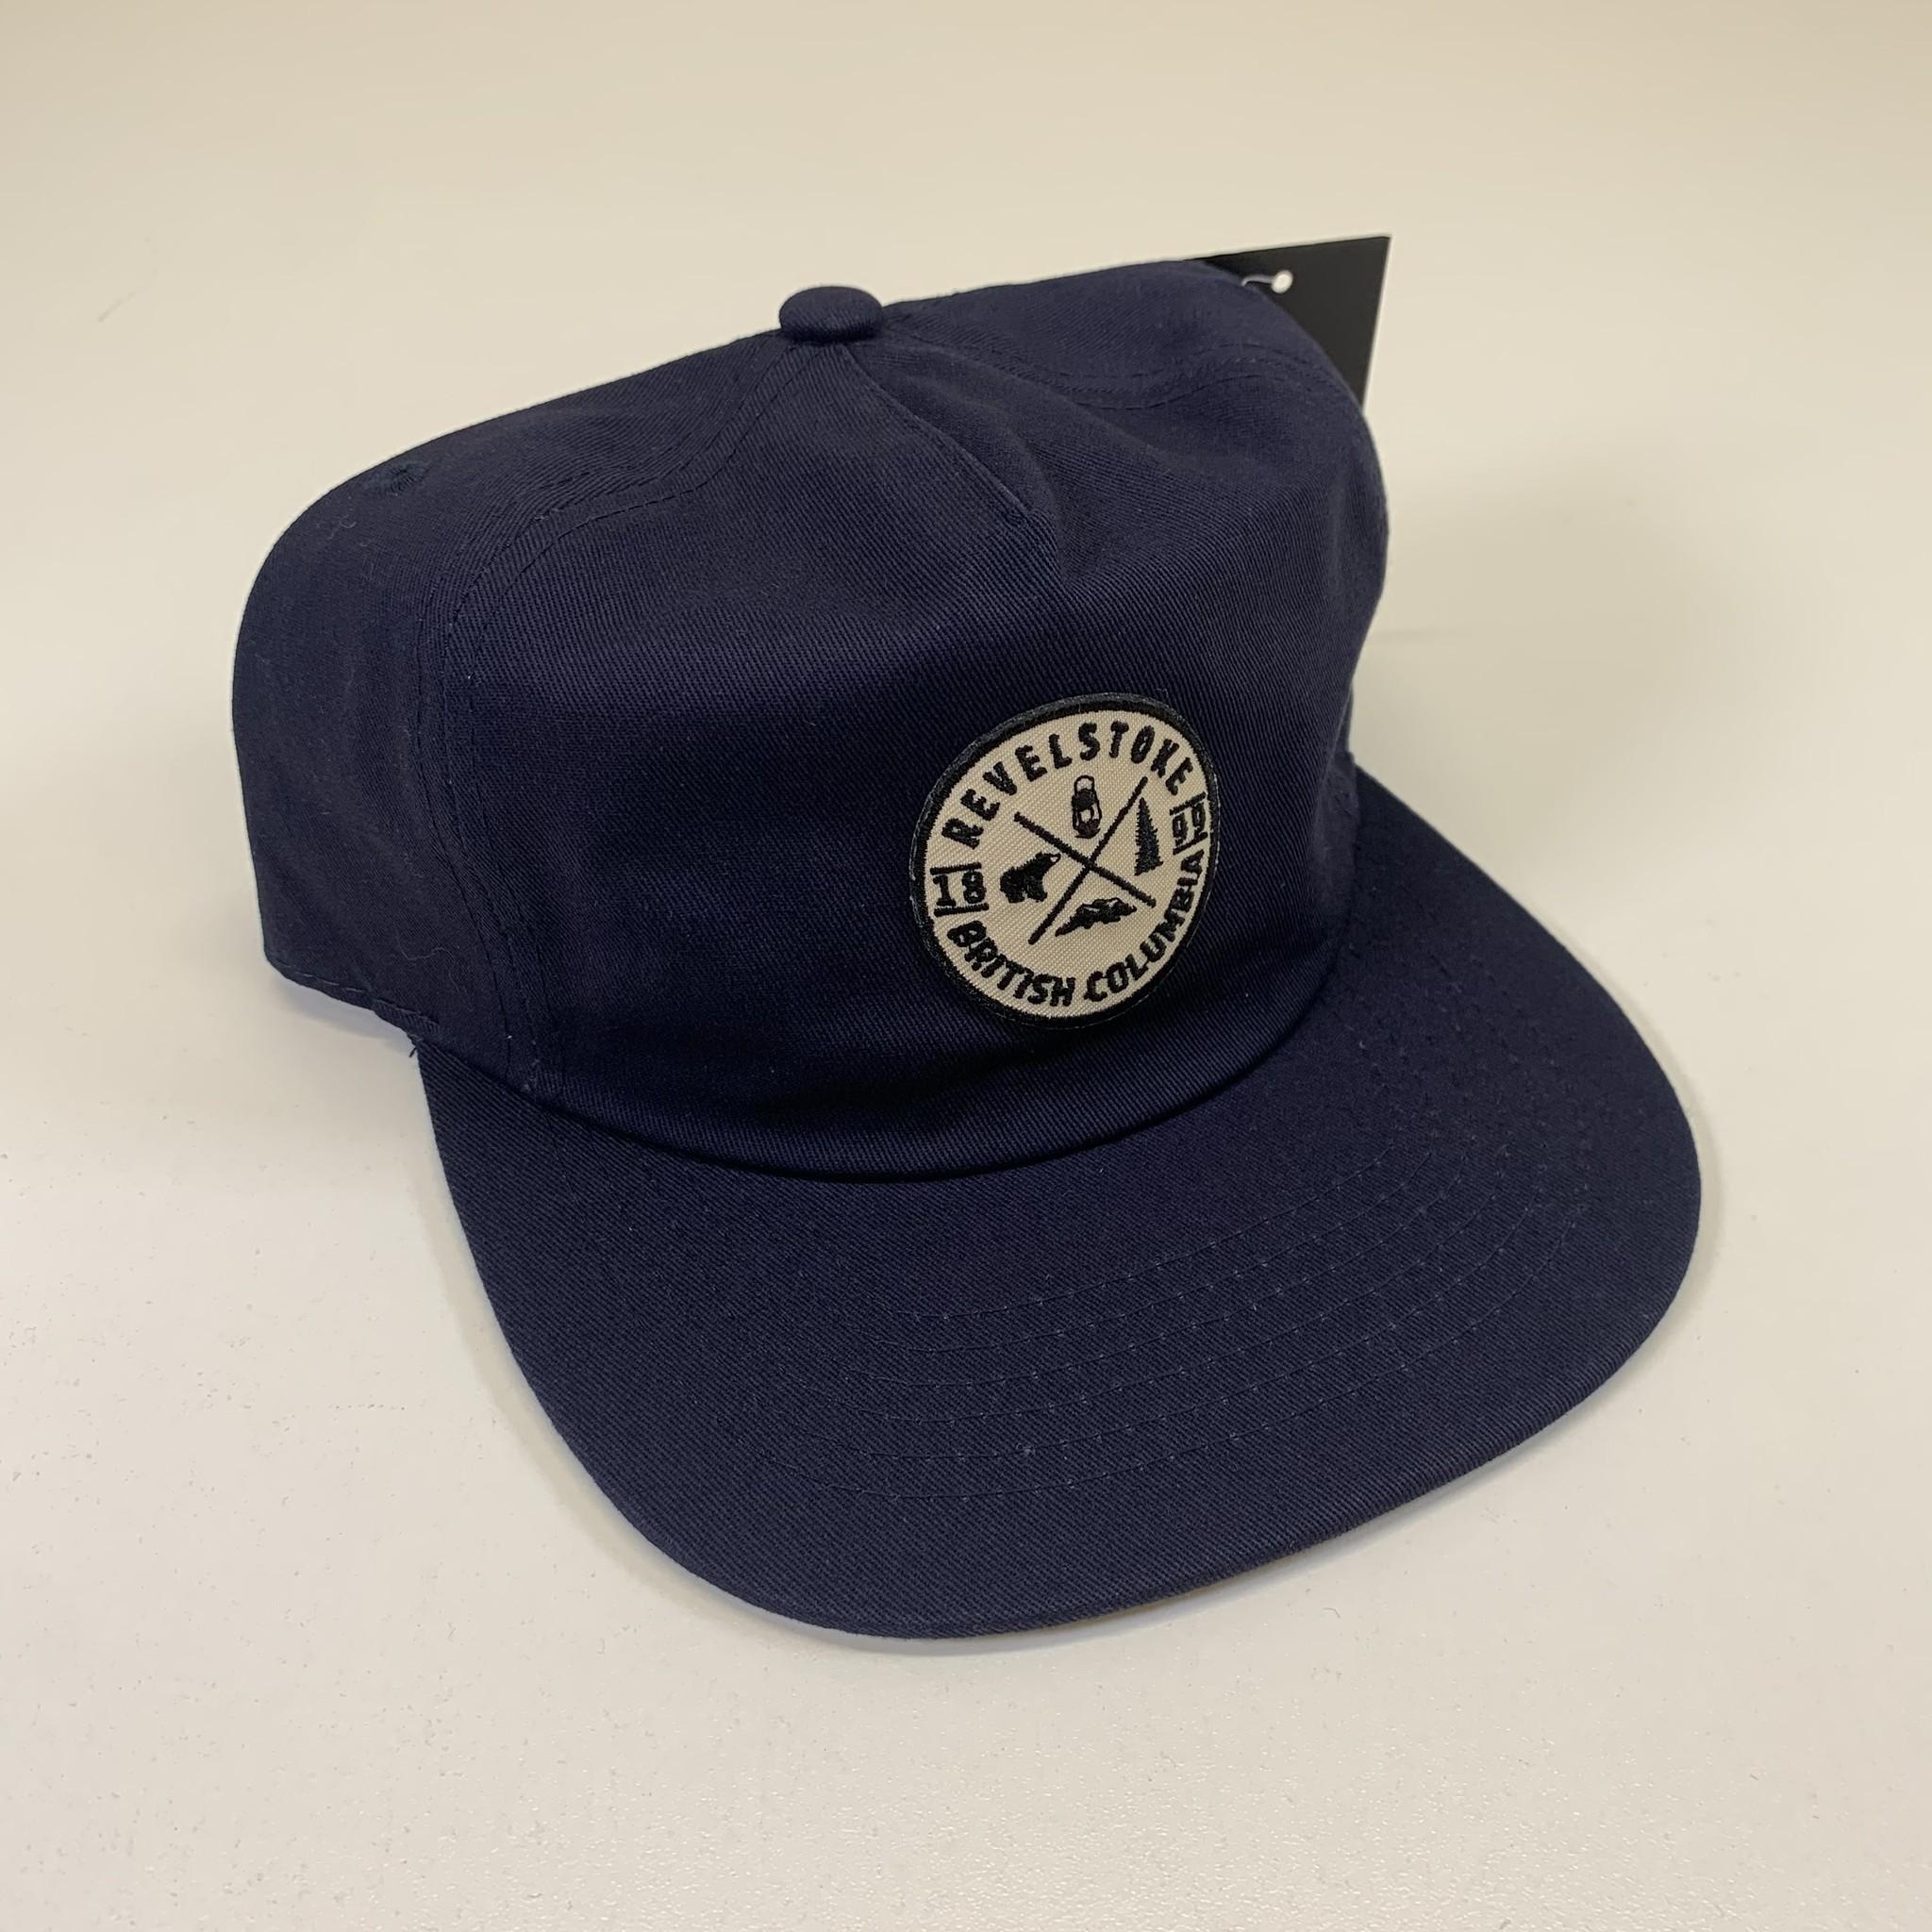 Trading Co. Revelstoke - 1899 Patch Cap (Navy)